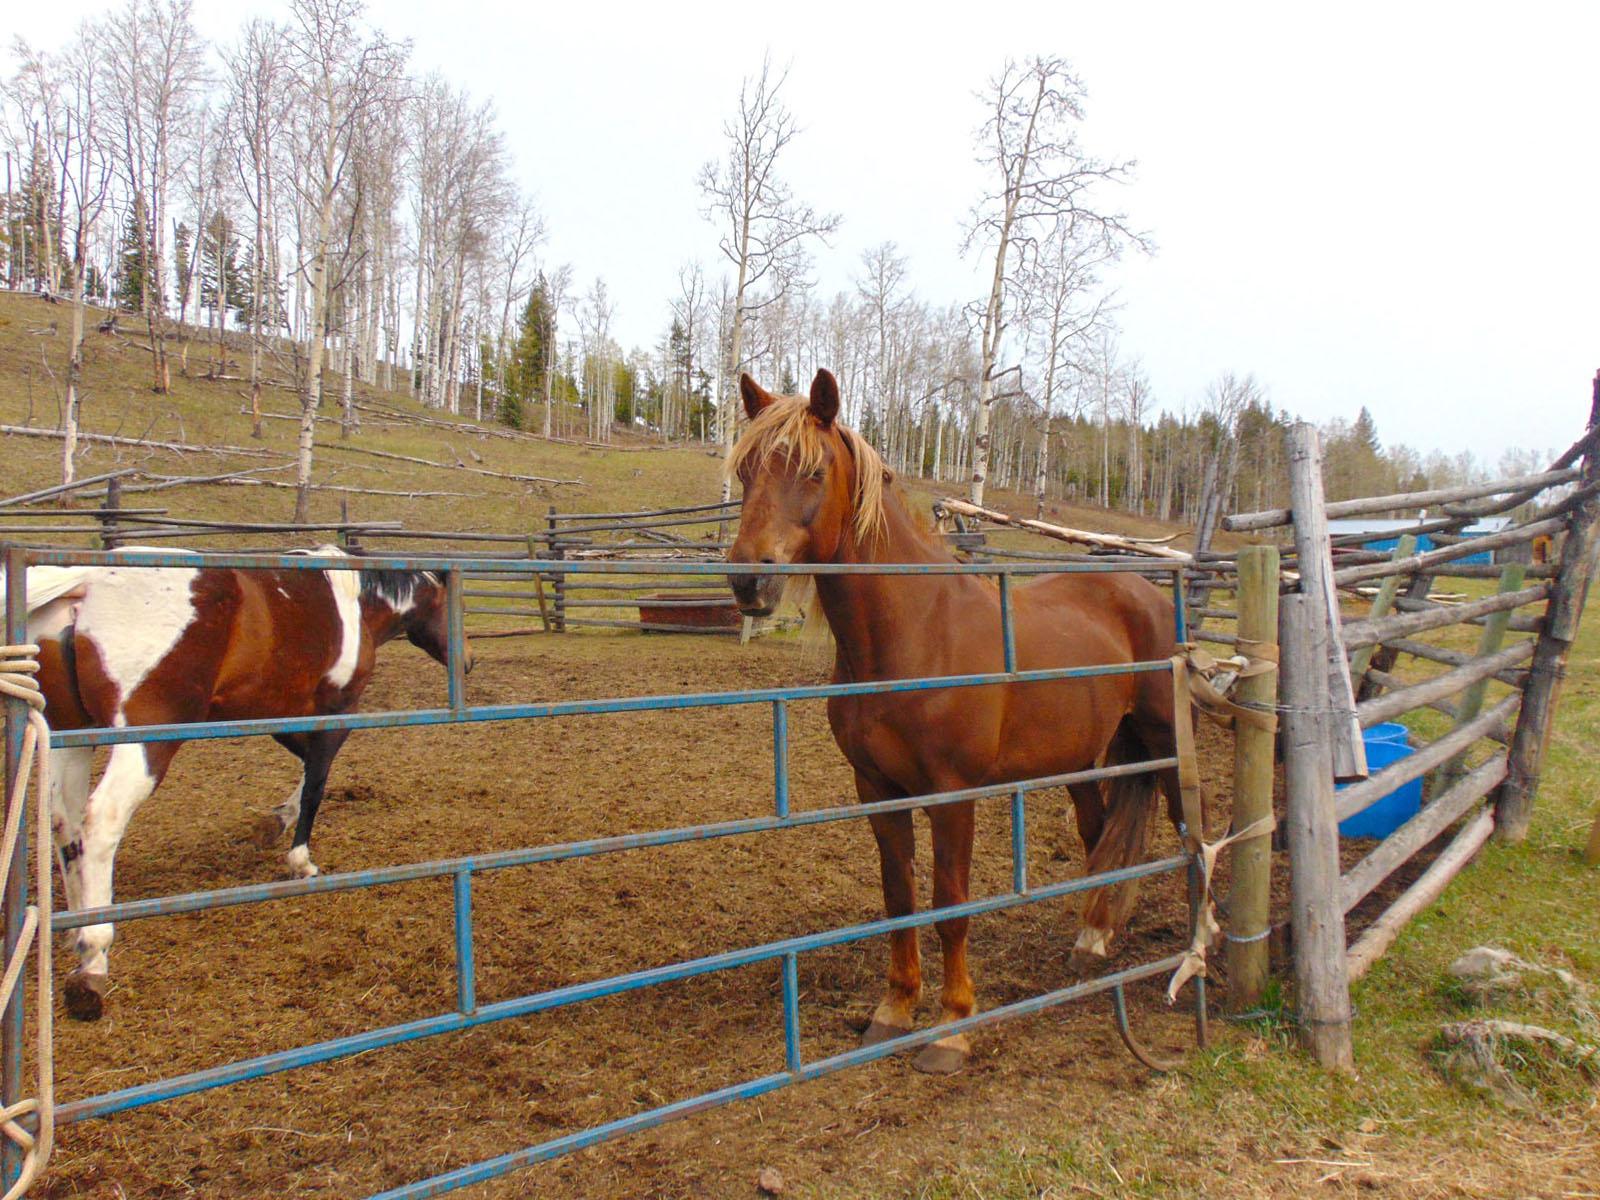 Moose horn ranch 18